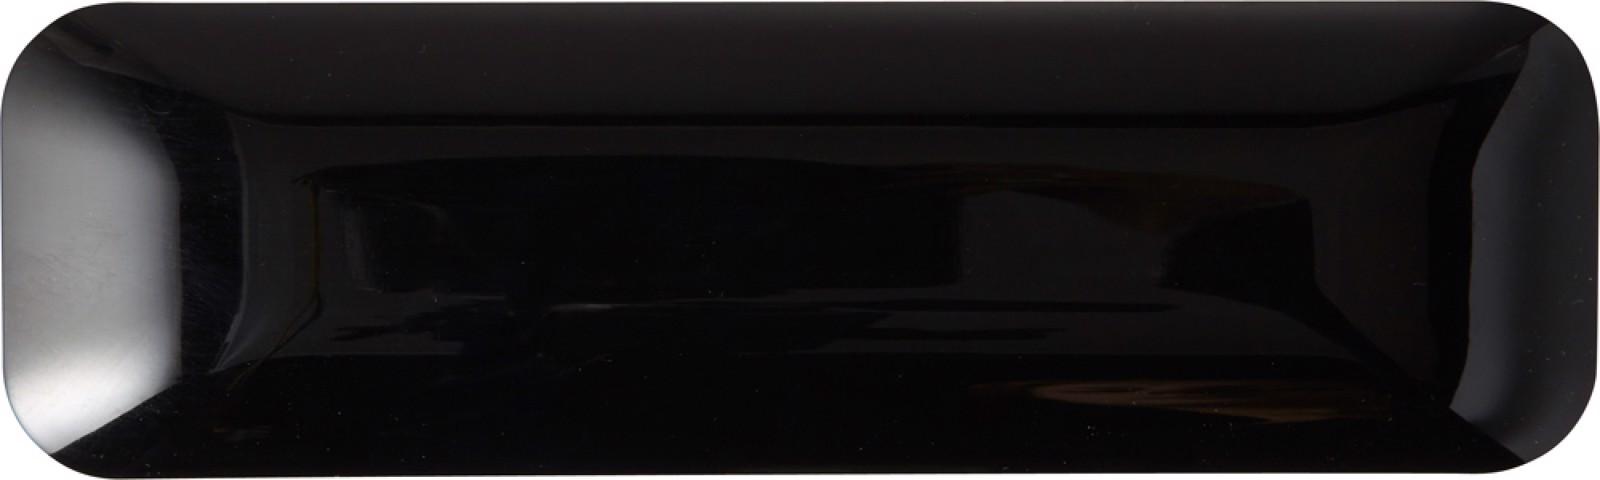 Writing set in presentation box - Black